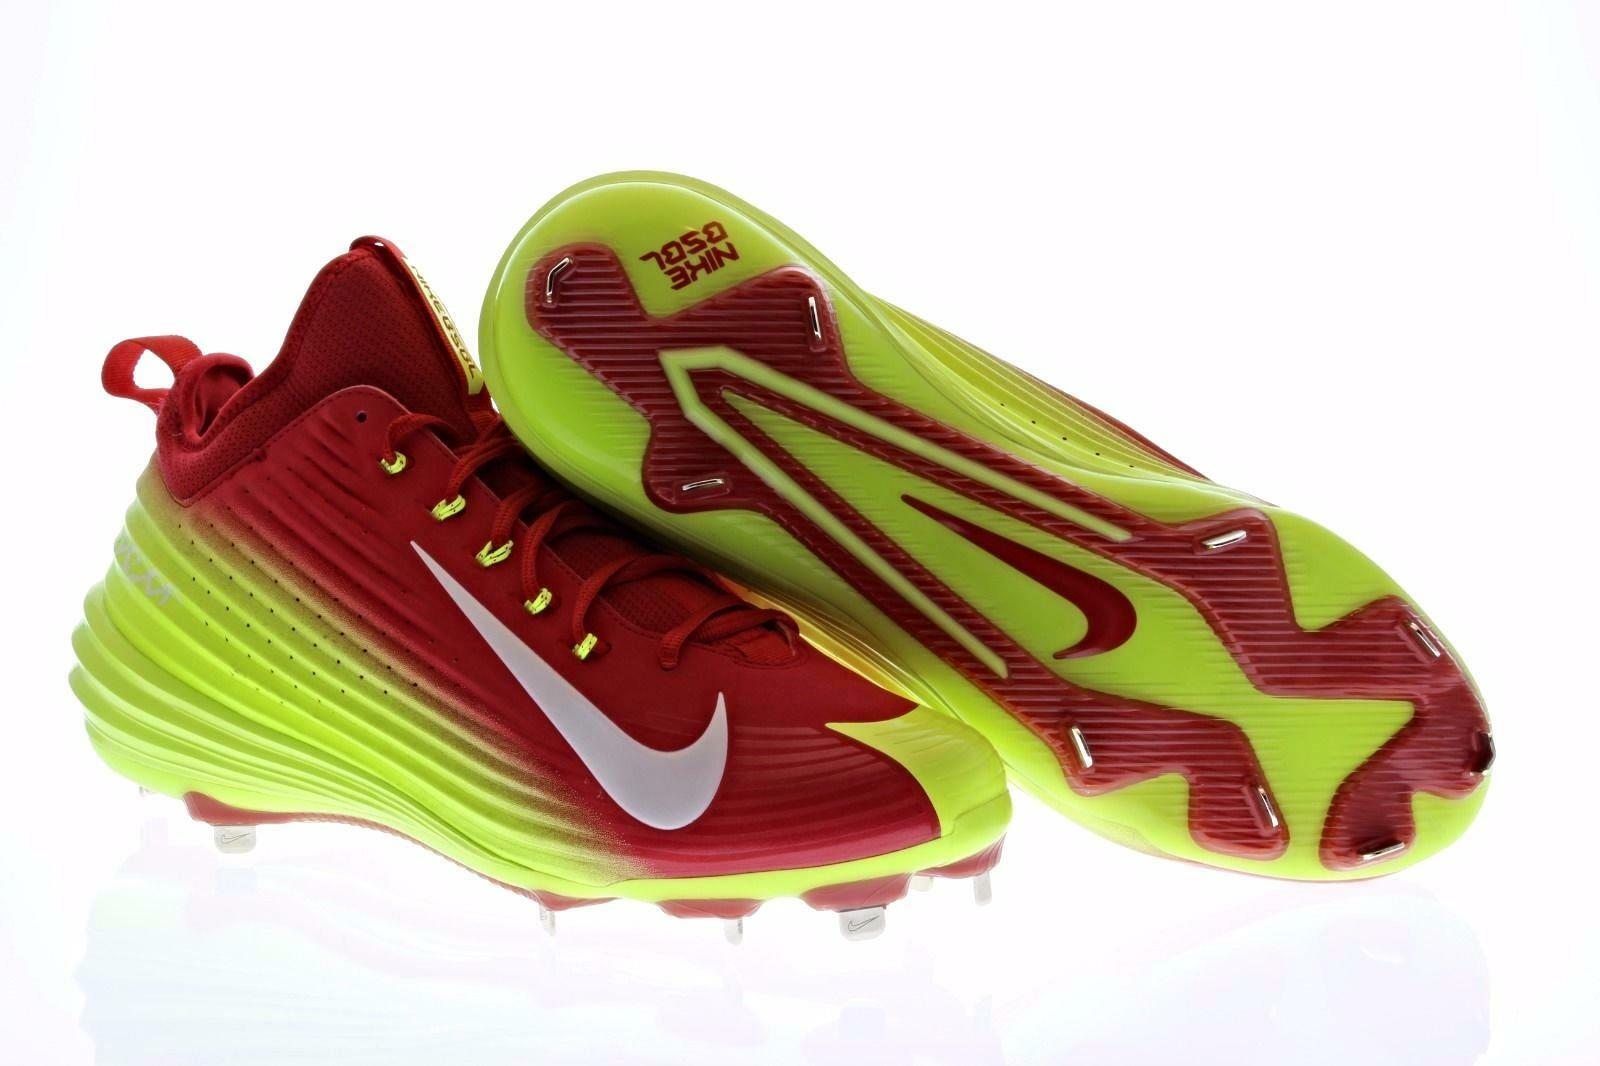 finest selection ca630 60c46 Nike Vapor Trout Hombre baseball de metal metal metal spike Rojo Blanco  654853-617 cómodo